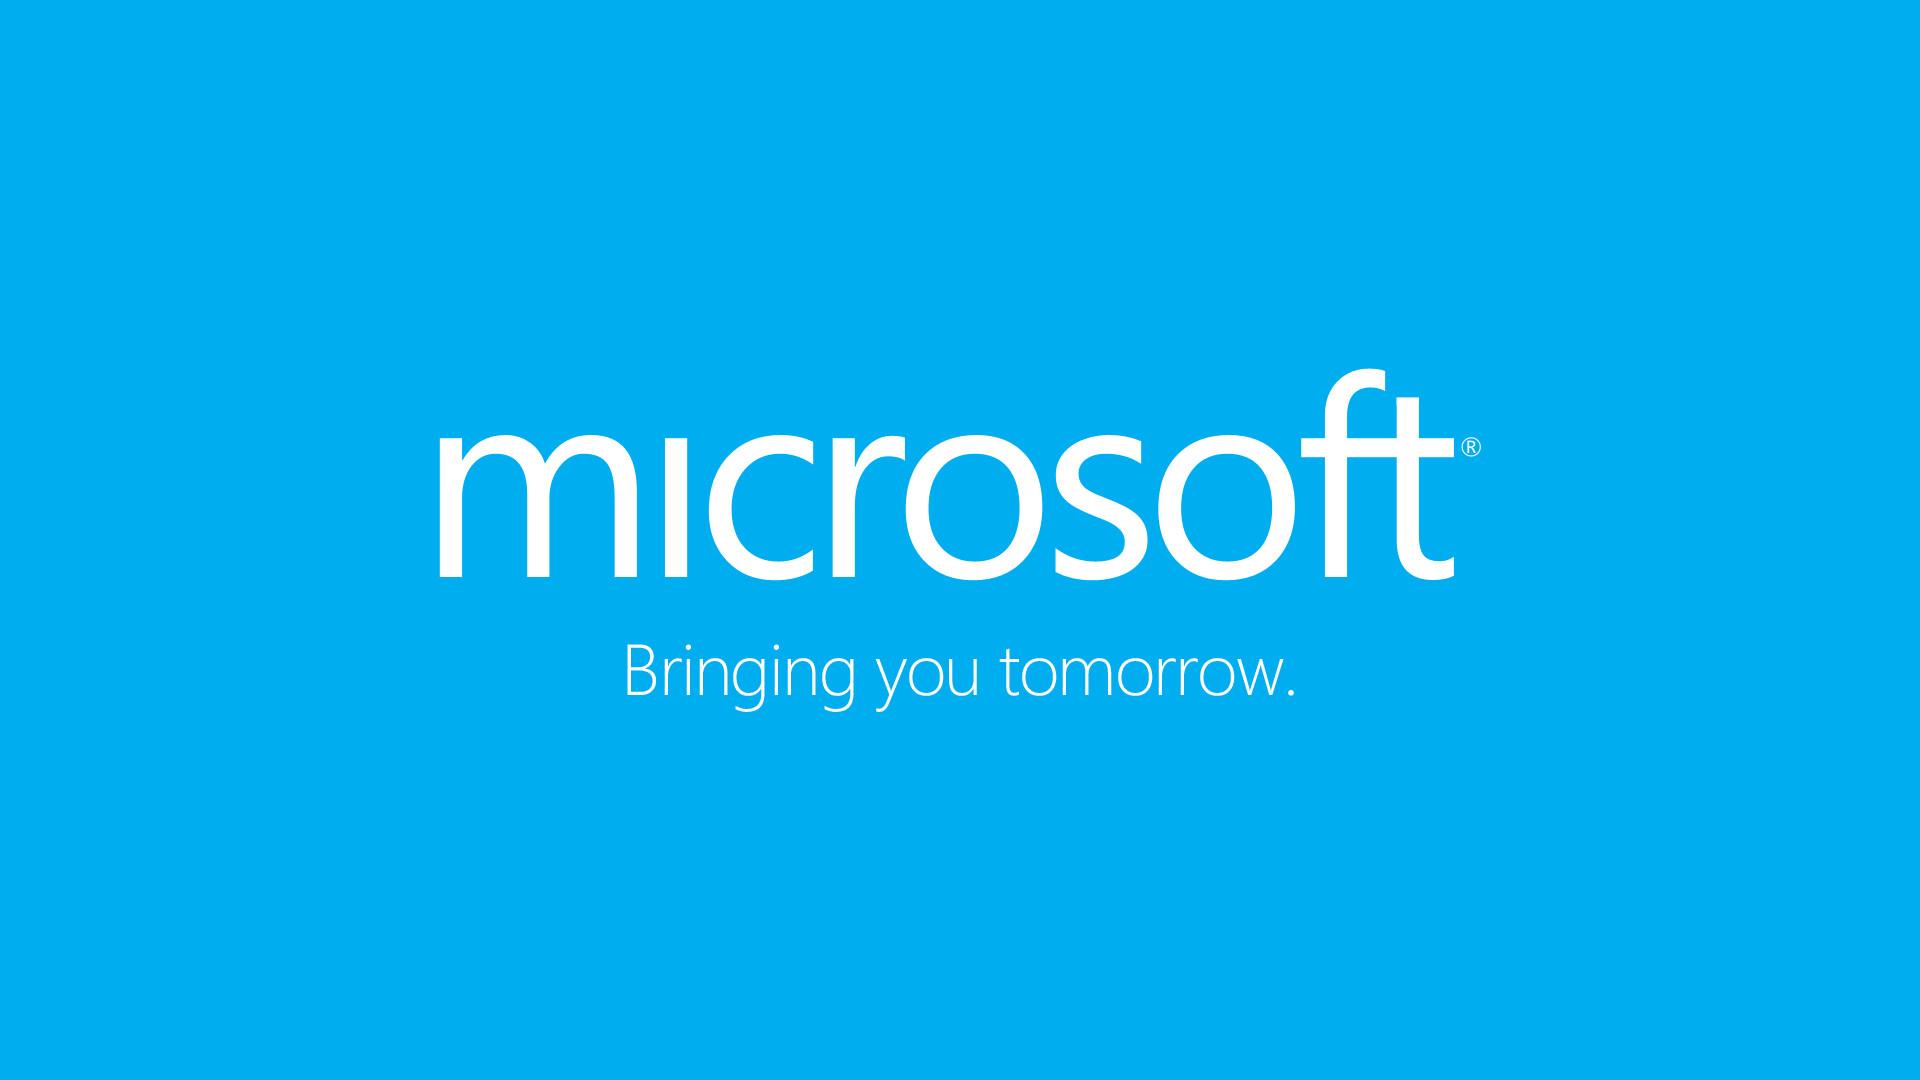 Microsoft-Logo-HD-Wallpapers-1080p